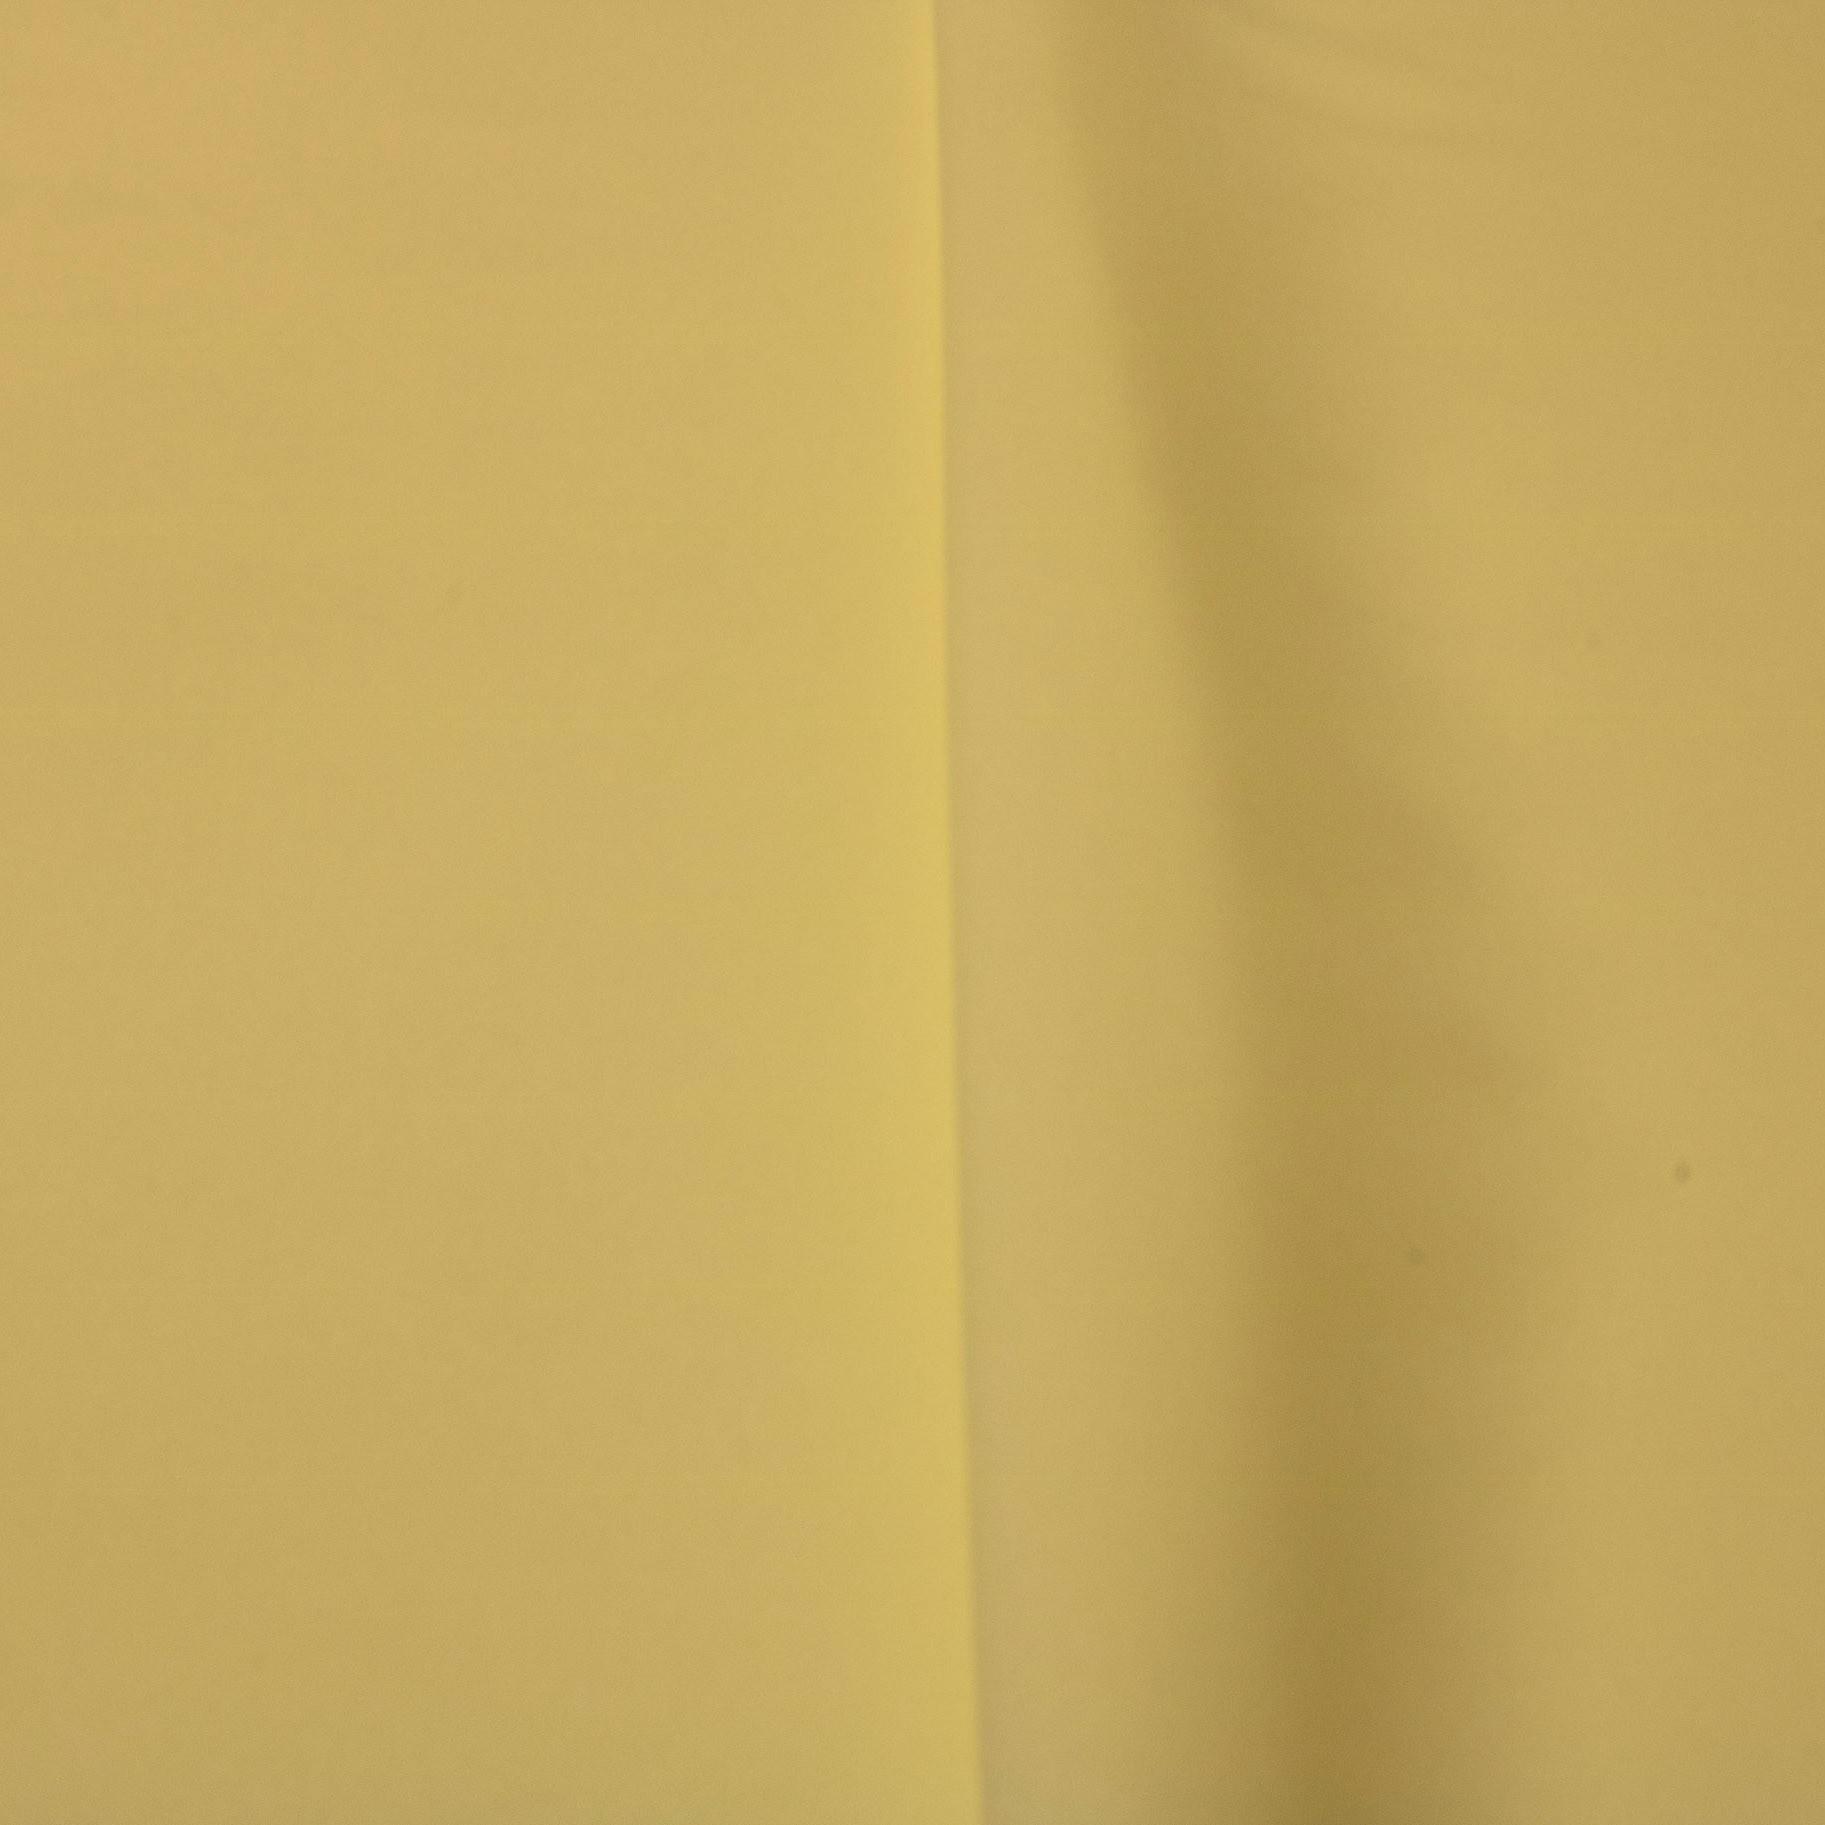 Tecido Oxford Liso 100% Poliester 1,50 m Largura Creme